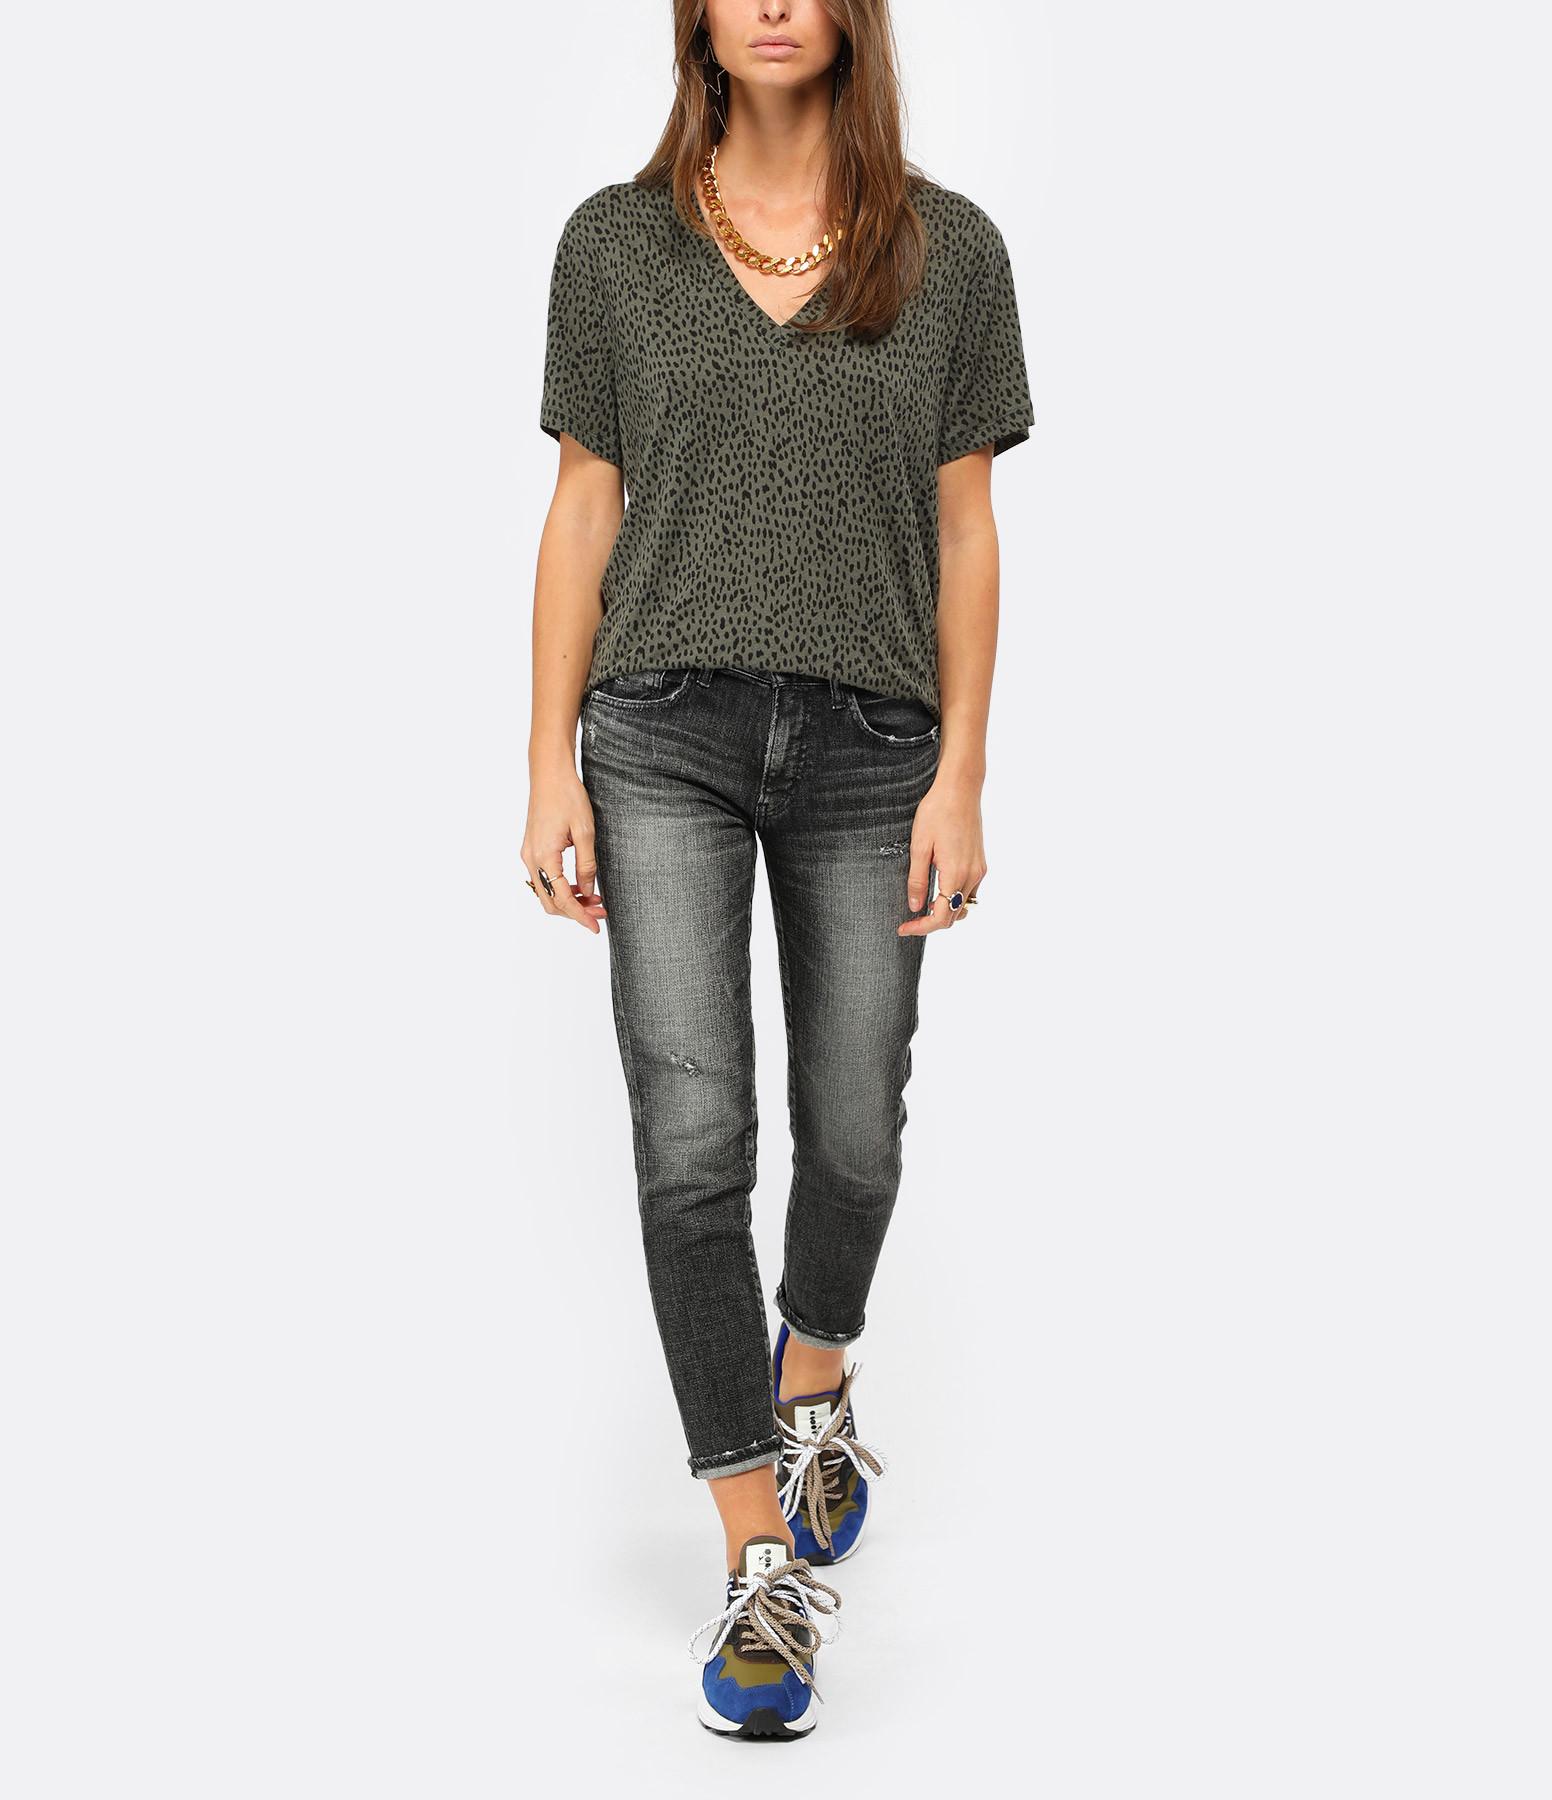 RAILS - Tee-shirt Cara Vert Olive